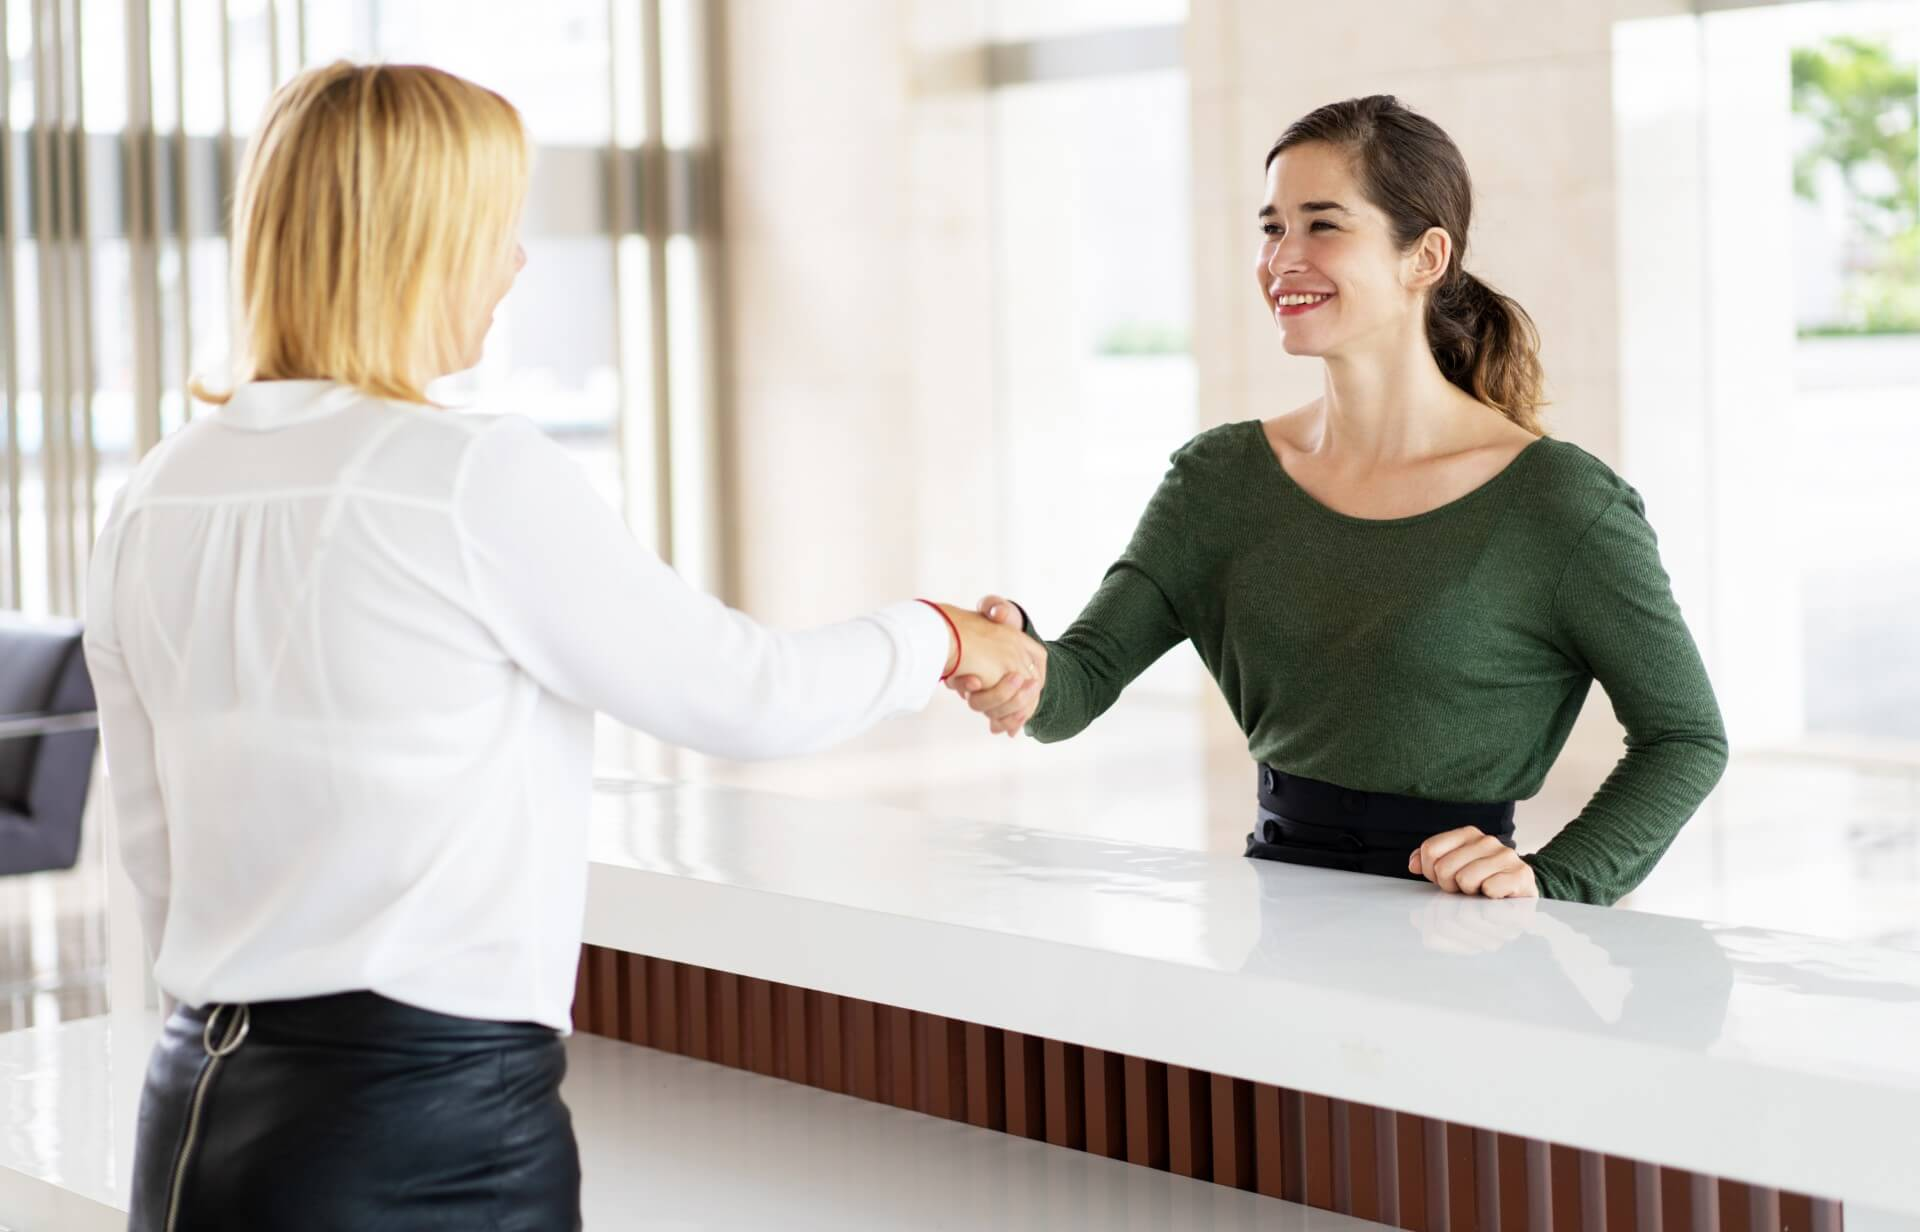 receptionist welcoming a guest with a handshake Επαγγελματικά Σεμινάρια Υπάλληλος Υποδοχής – Κρατήσεων Front Office Manager - Receptionist | Ξενοδοχειακό Πρόγραμμα Κρατήσεων PROTEL